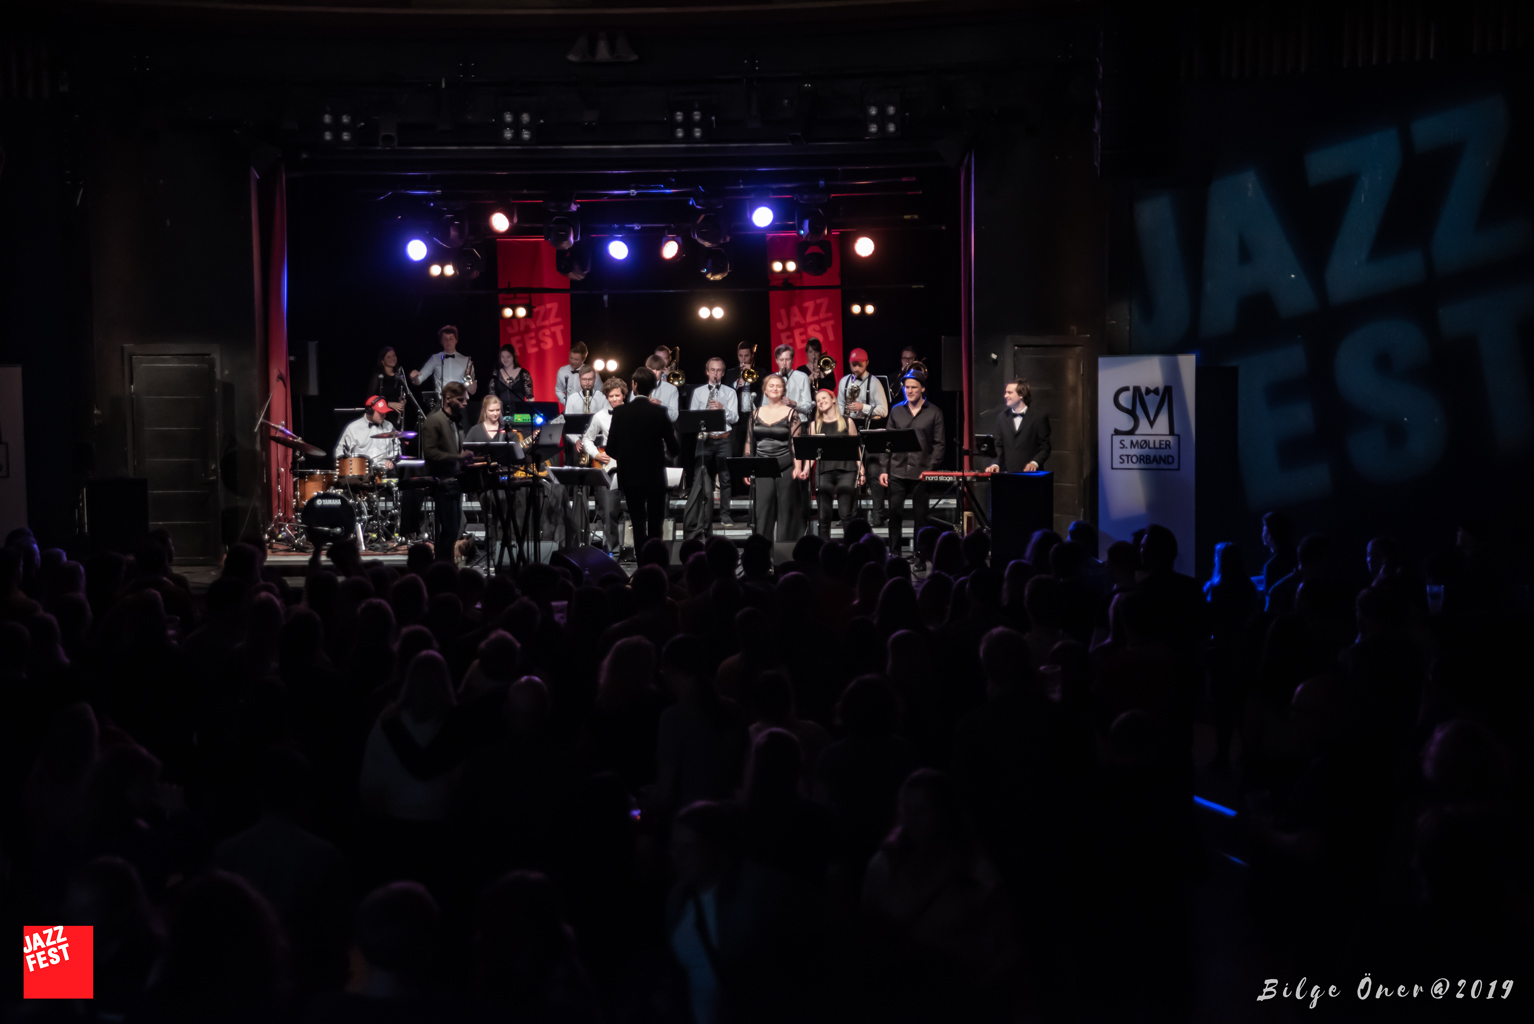 110519-S.-Møller-Beats-&-Big-Band-@-Studentsammfunnet-foto-Bilge-Öner-16.jpg